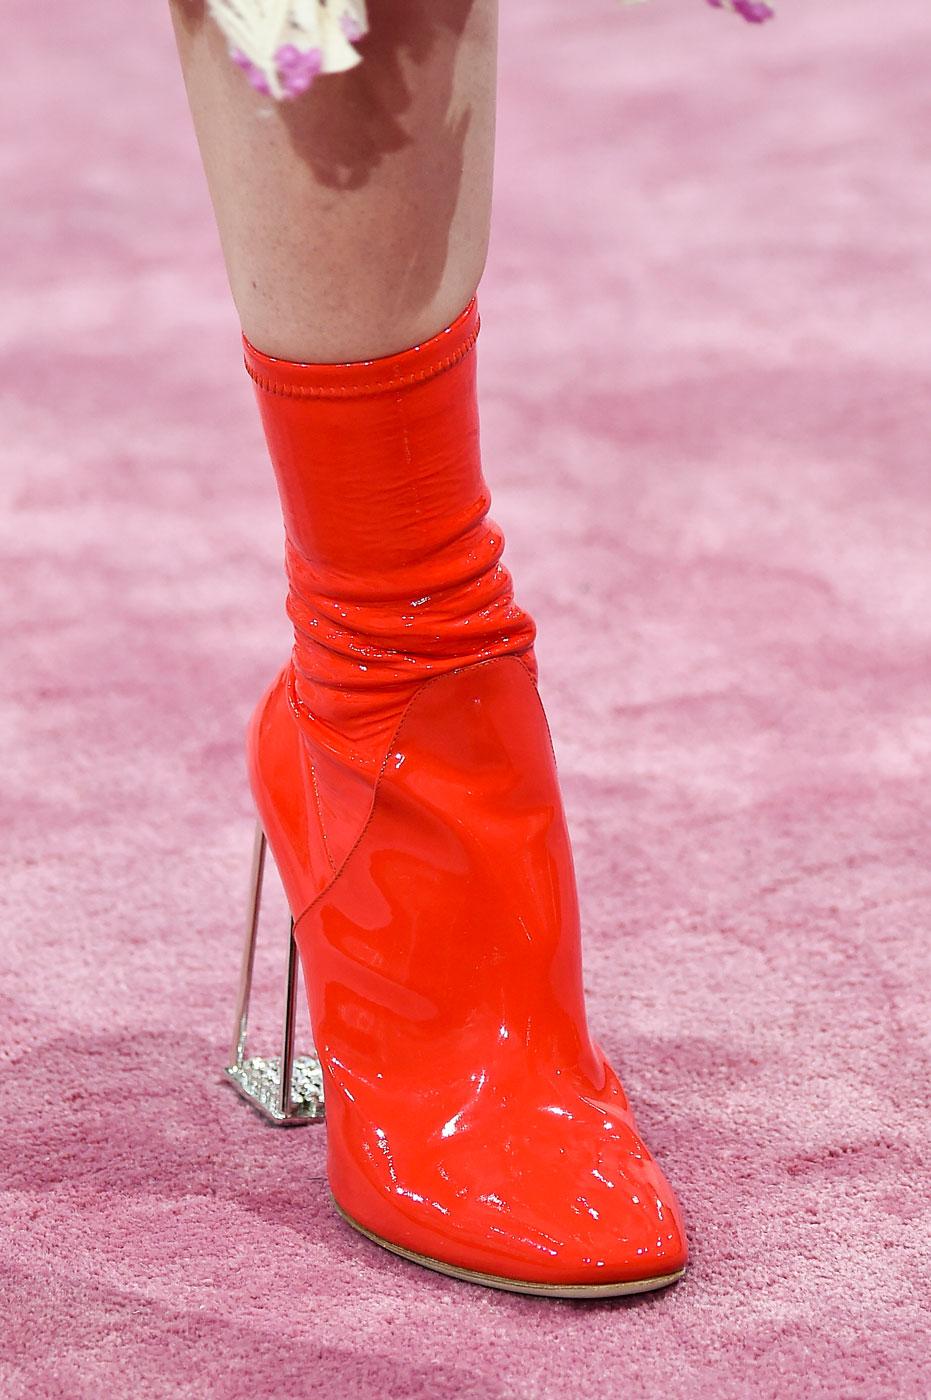 Christian-Dior-fashion-runway-show-close-ups-haute-couture-paris-spring-summer-2015-the-impression-111